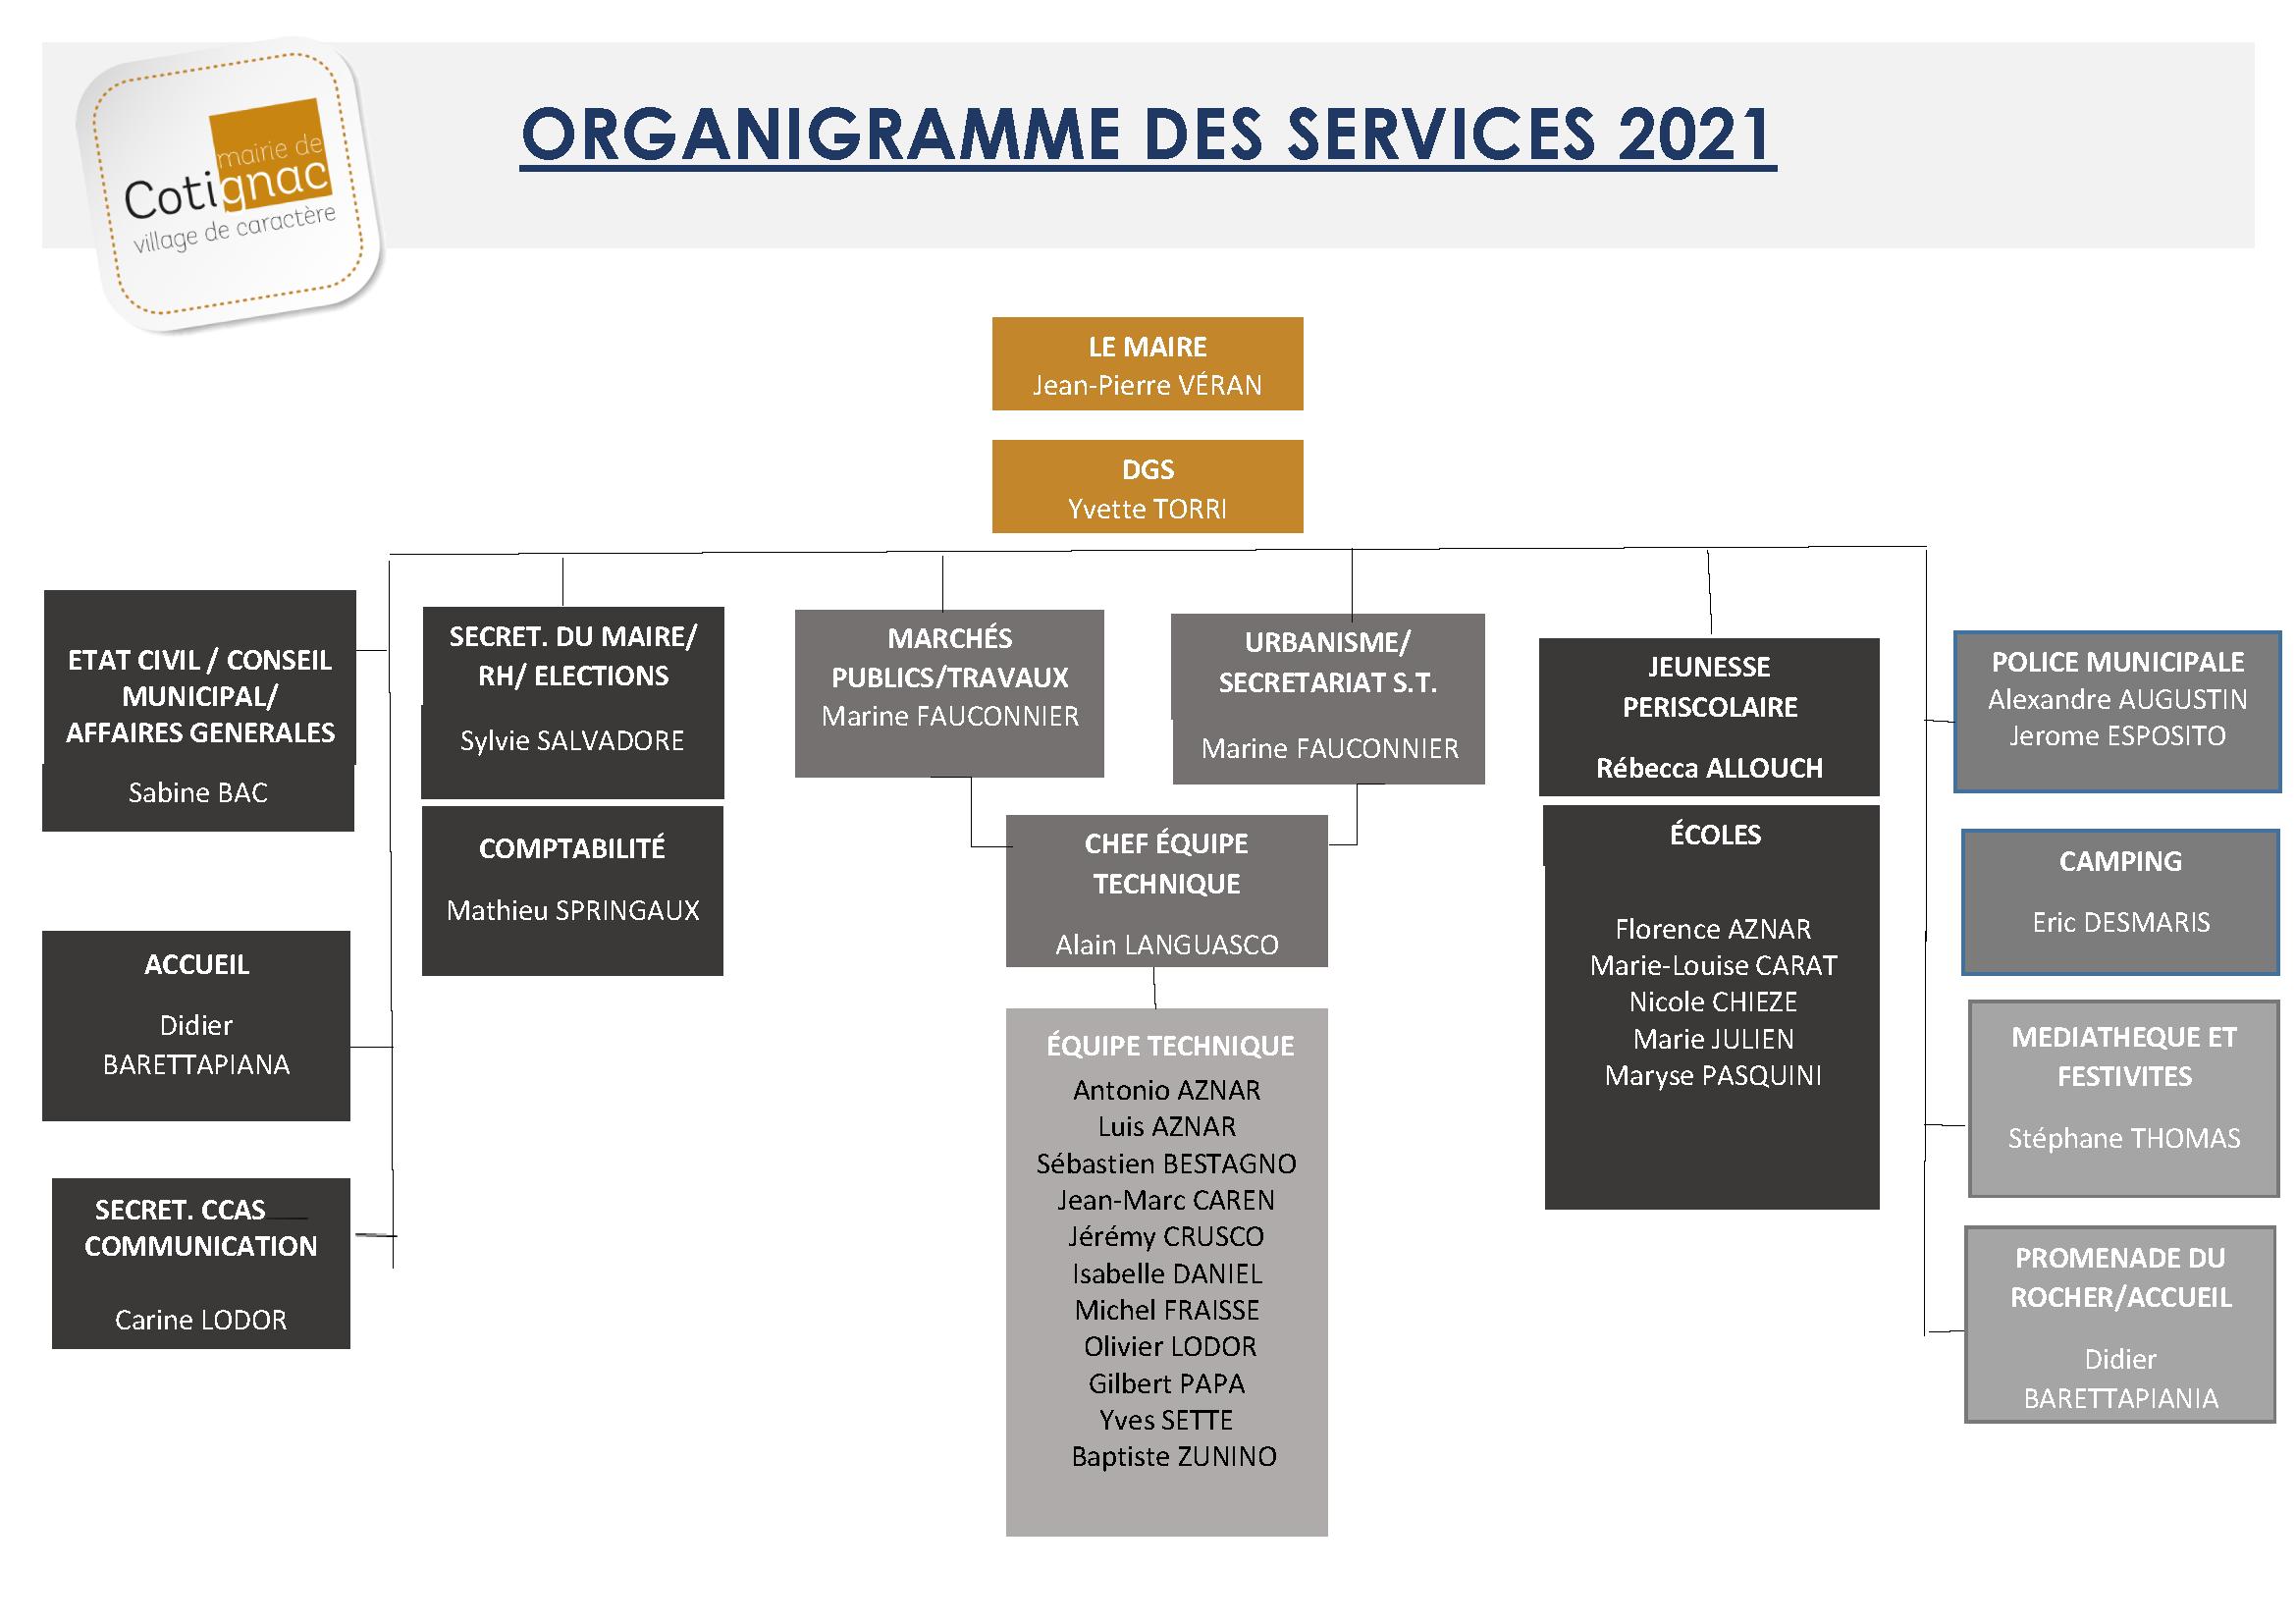 COTIGNAC--Organigramme-services-municipaux-2020